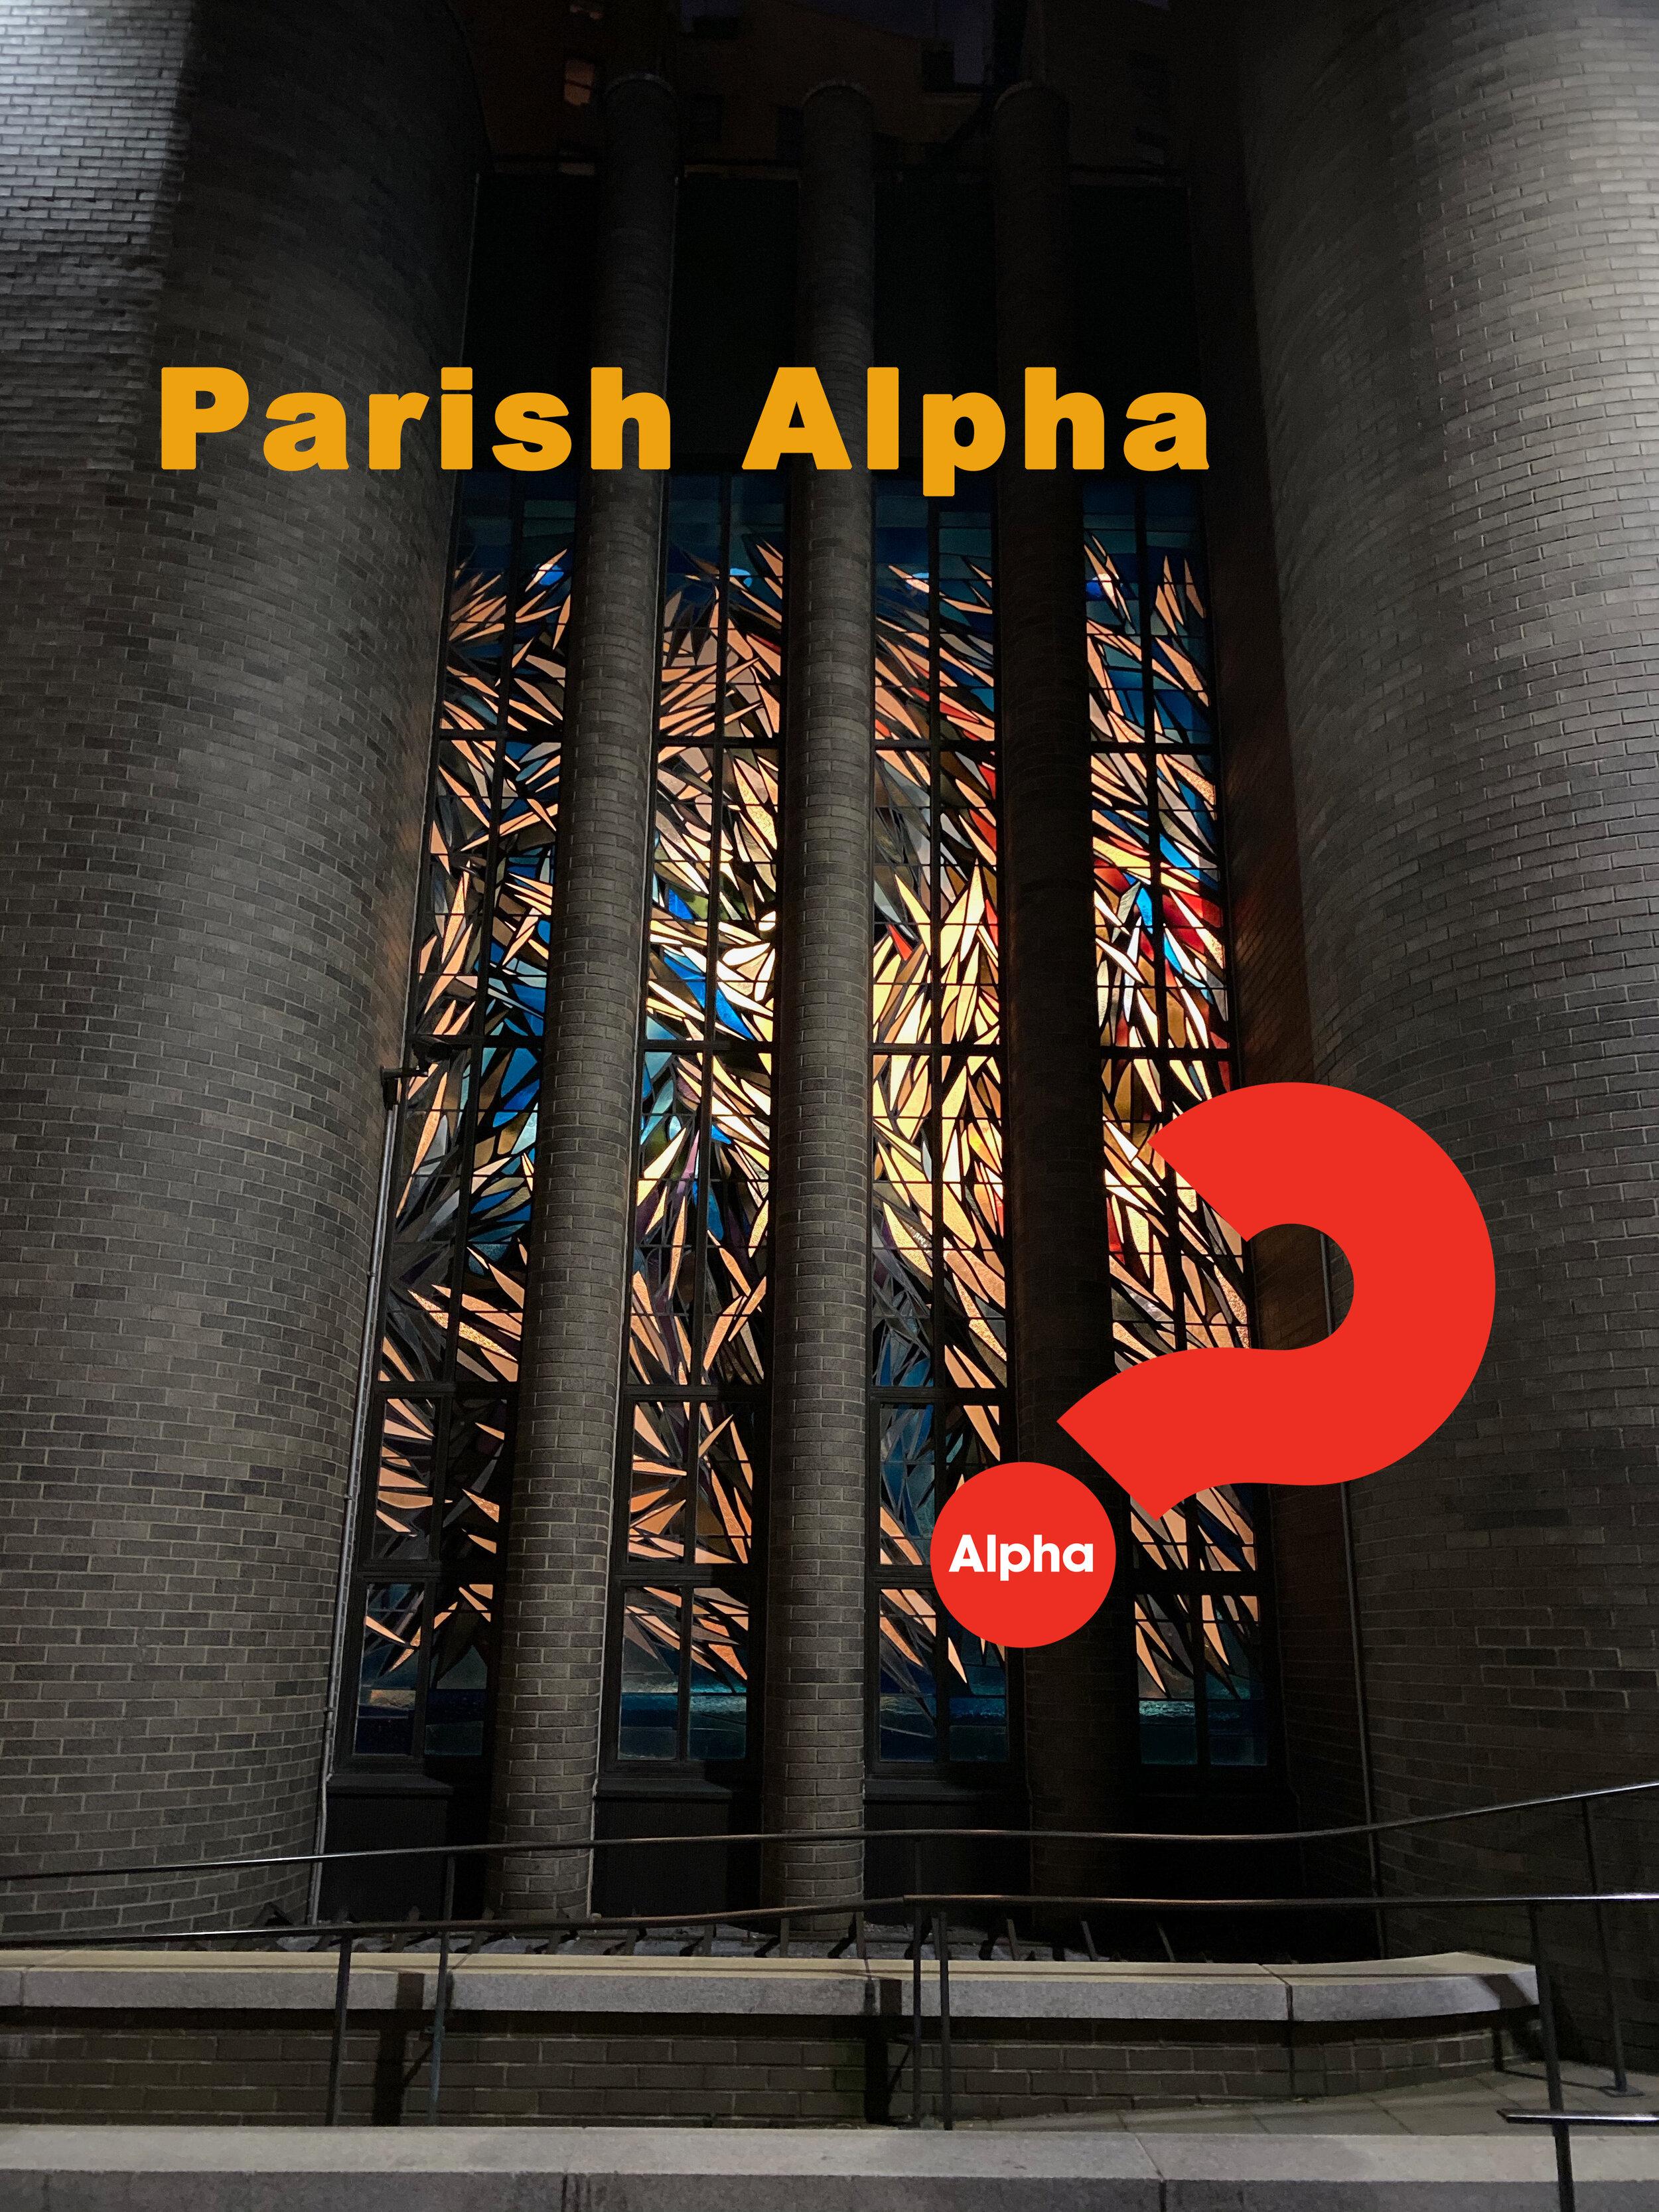 Parish Alpha image.jpg